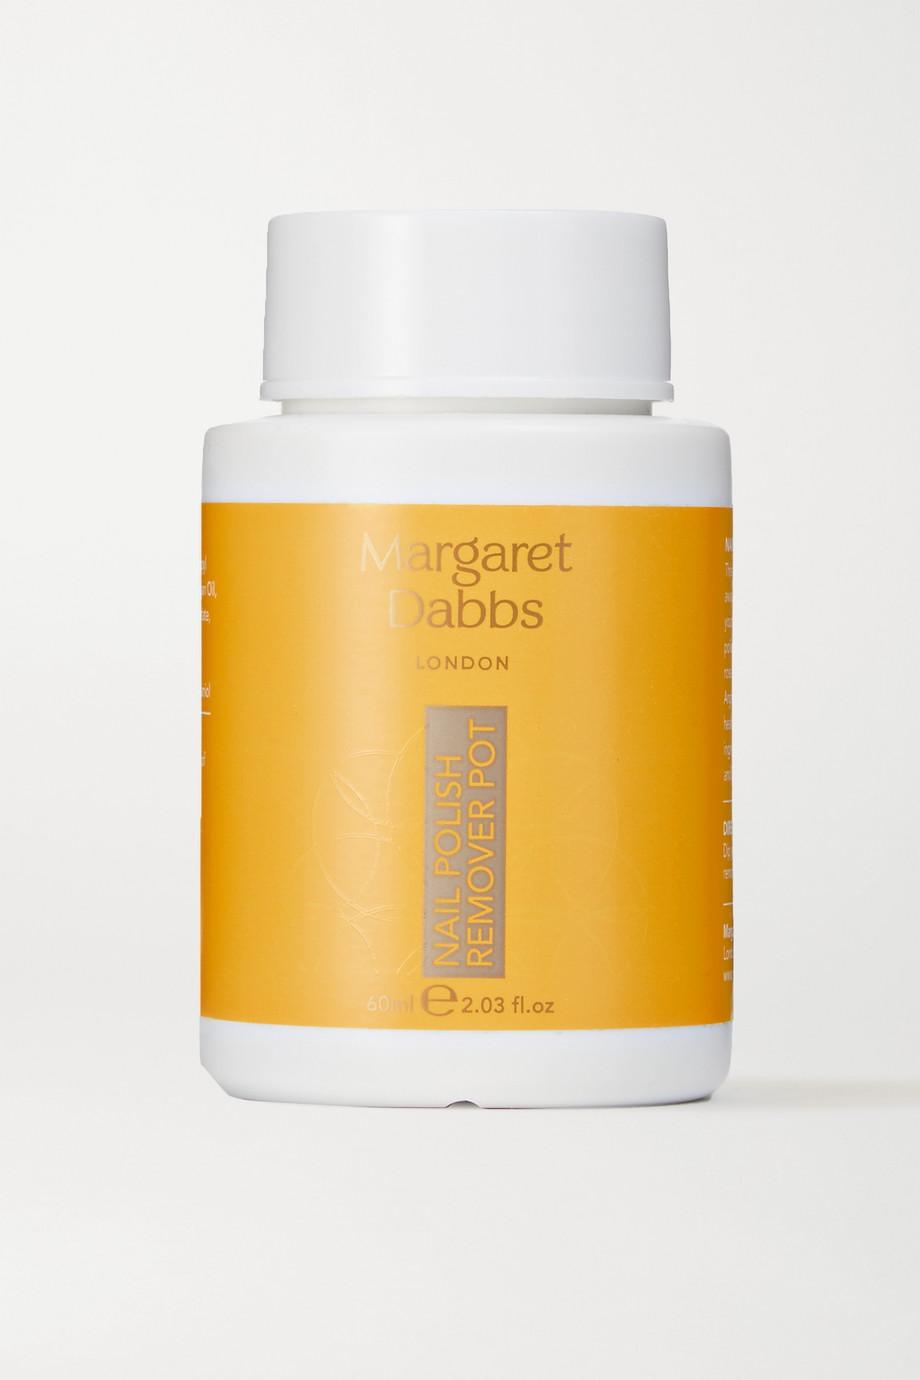 Margaret Dabbs London Nail Polish Remover Pot, 60 ml – Nagellackentferner